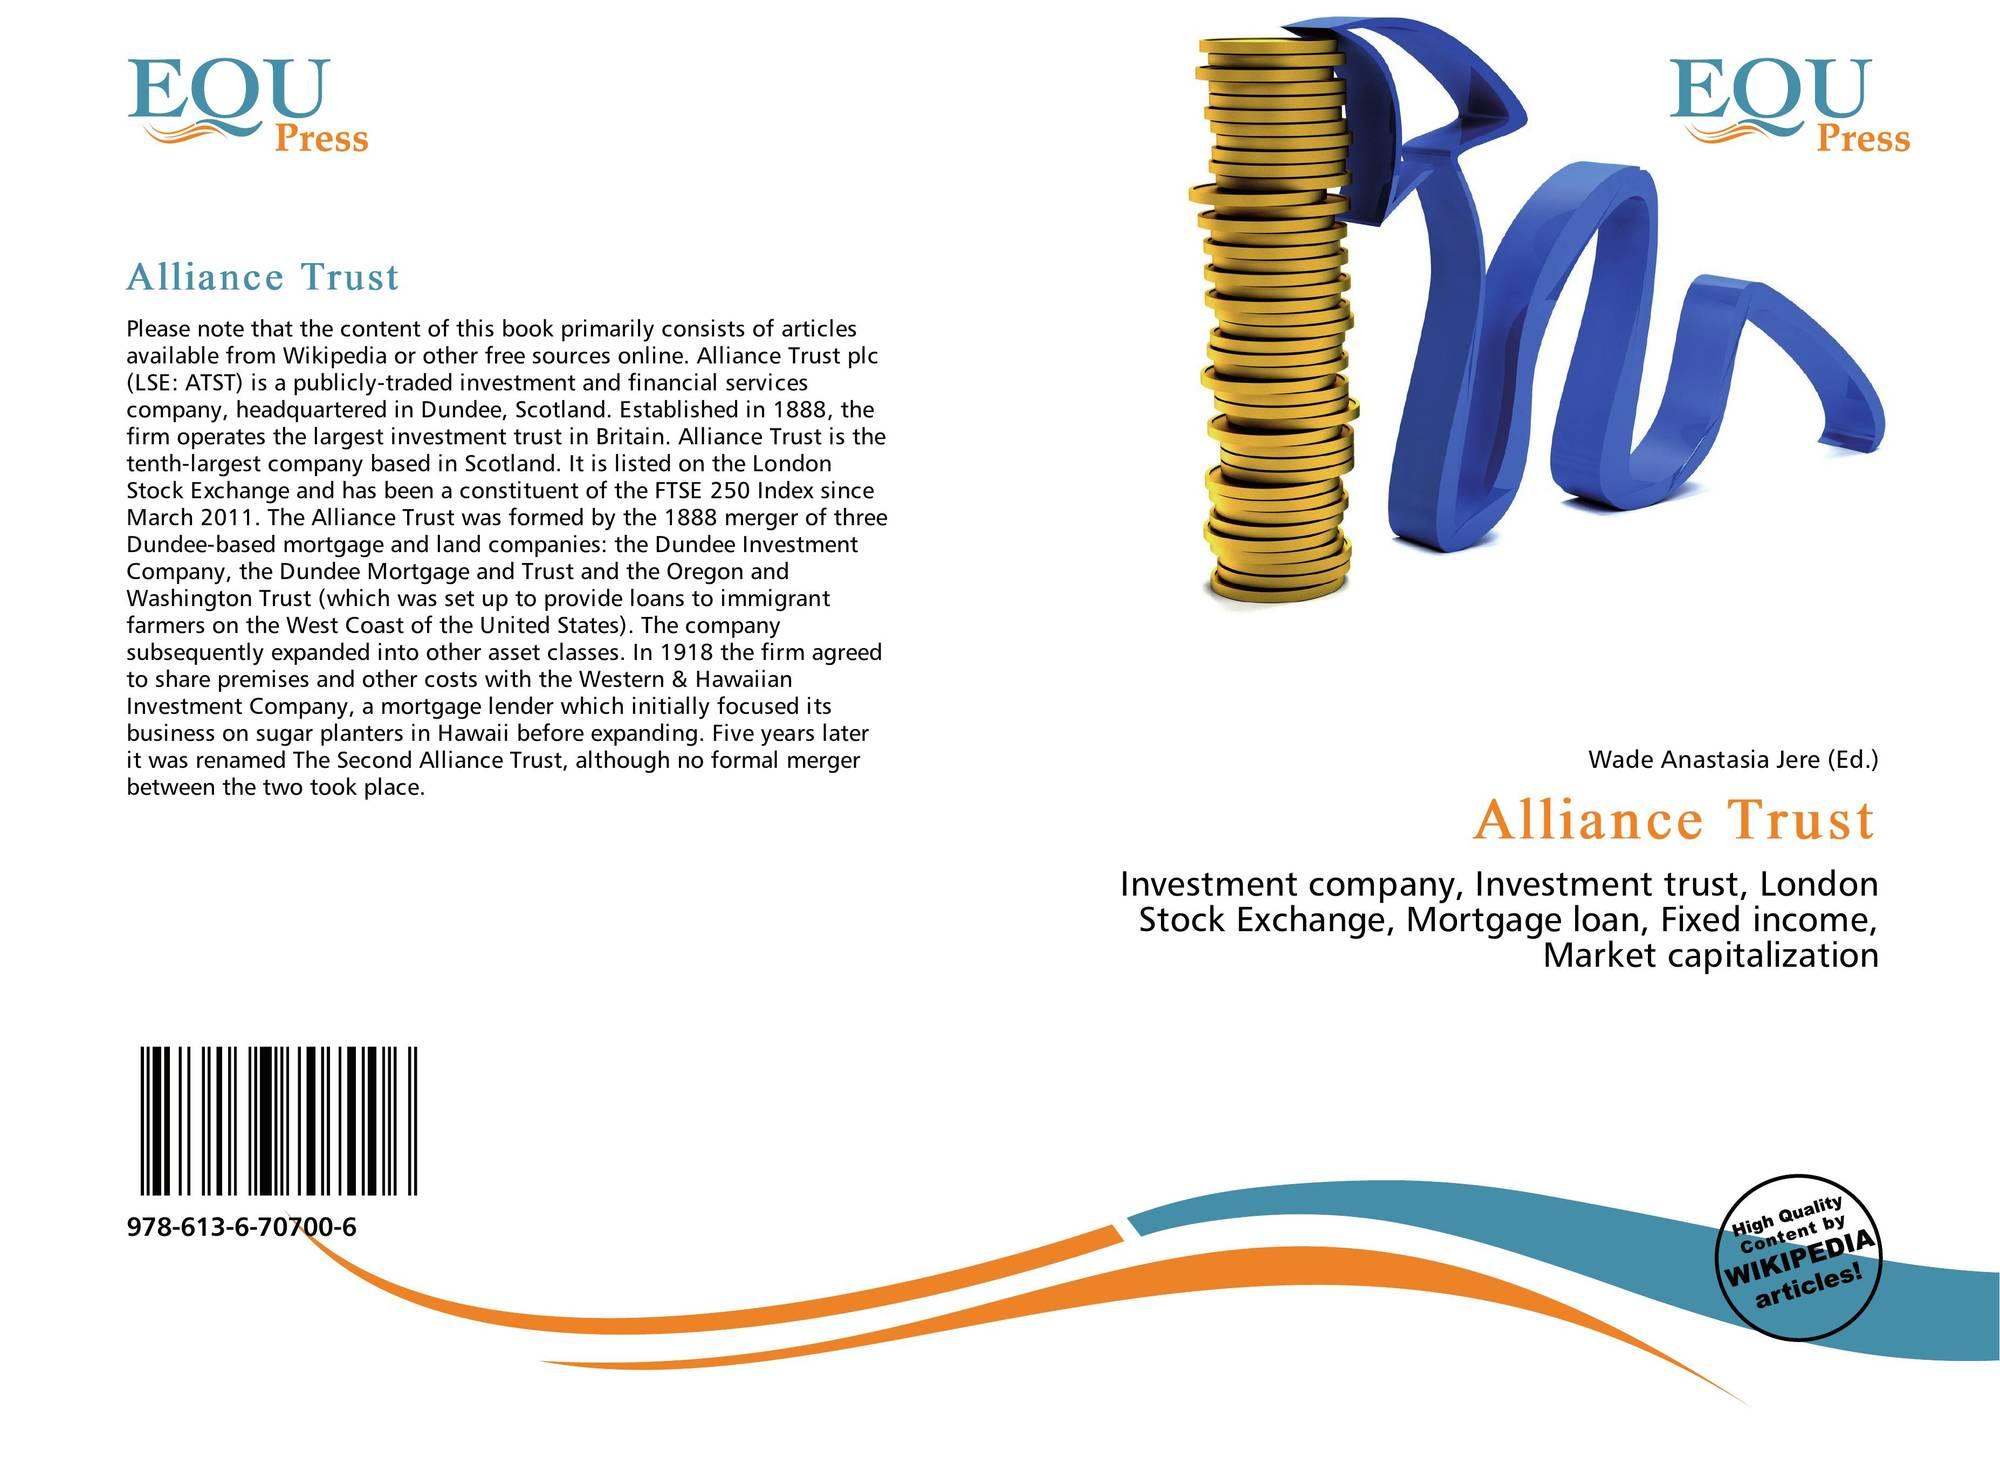 Alliance trust investments wikipedia focuri de primavera metaforex